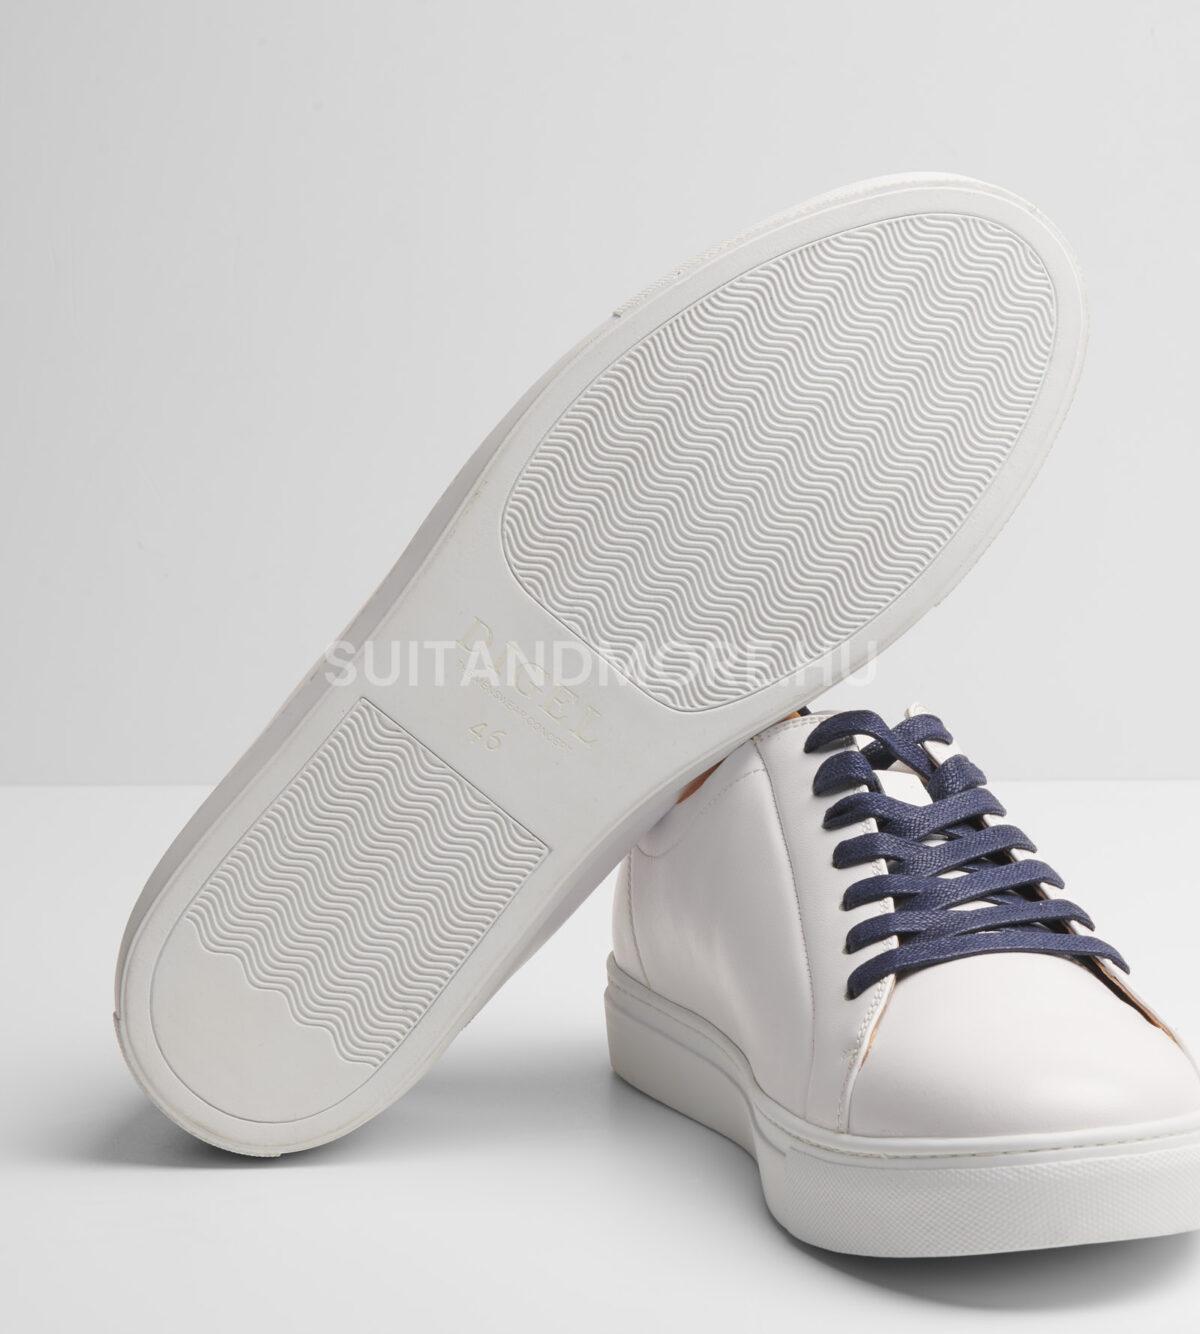 digel-feher-sneaker-cipo-seth-1199716-80-03